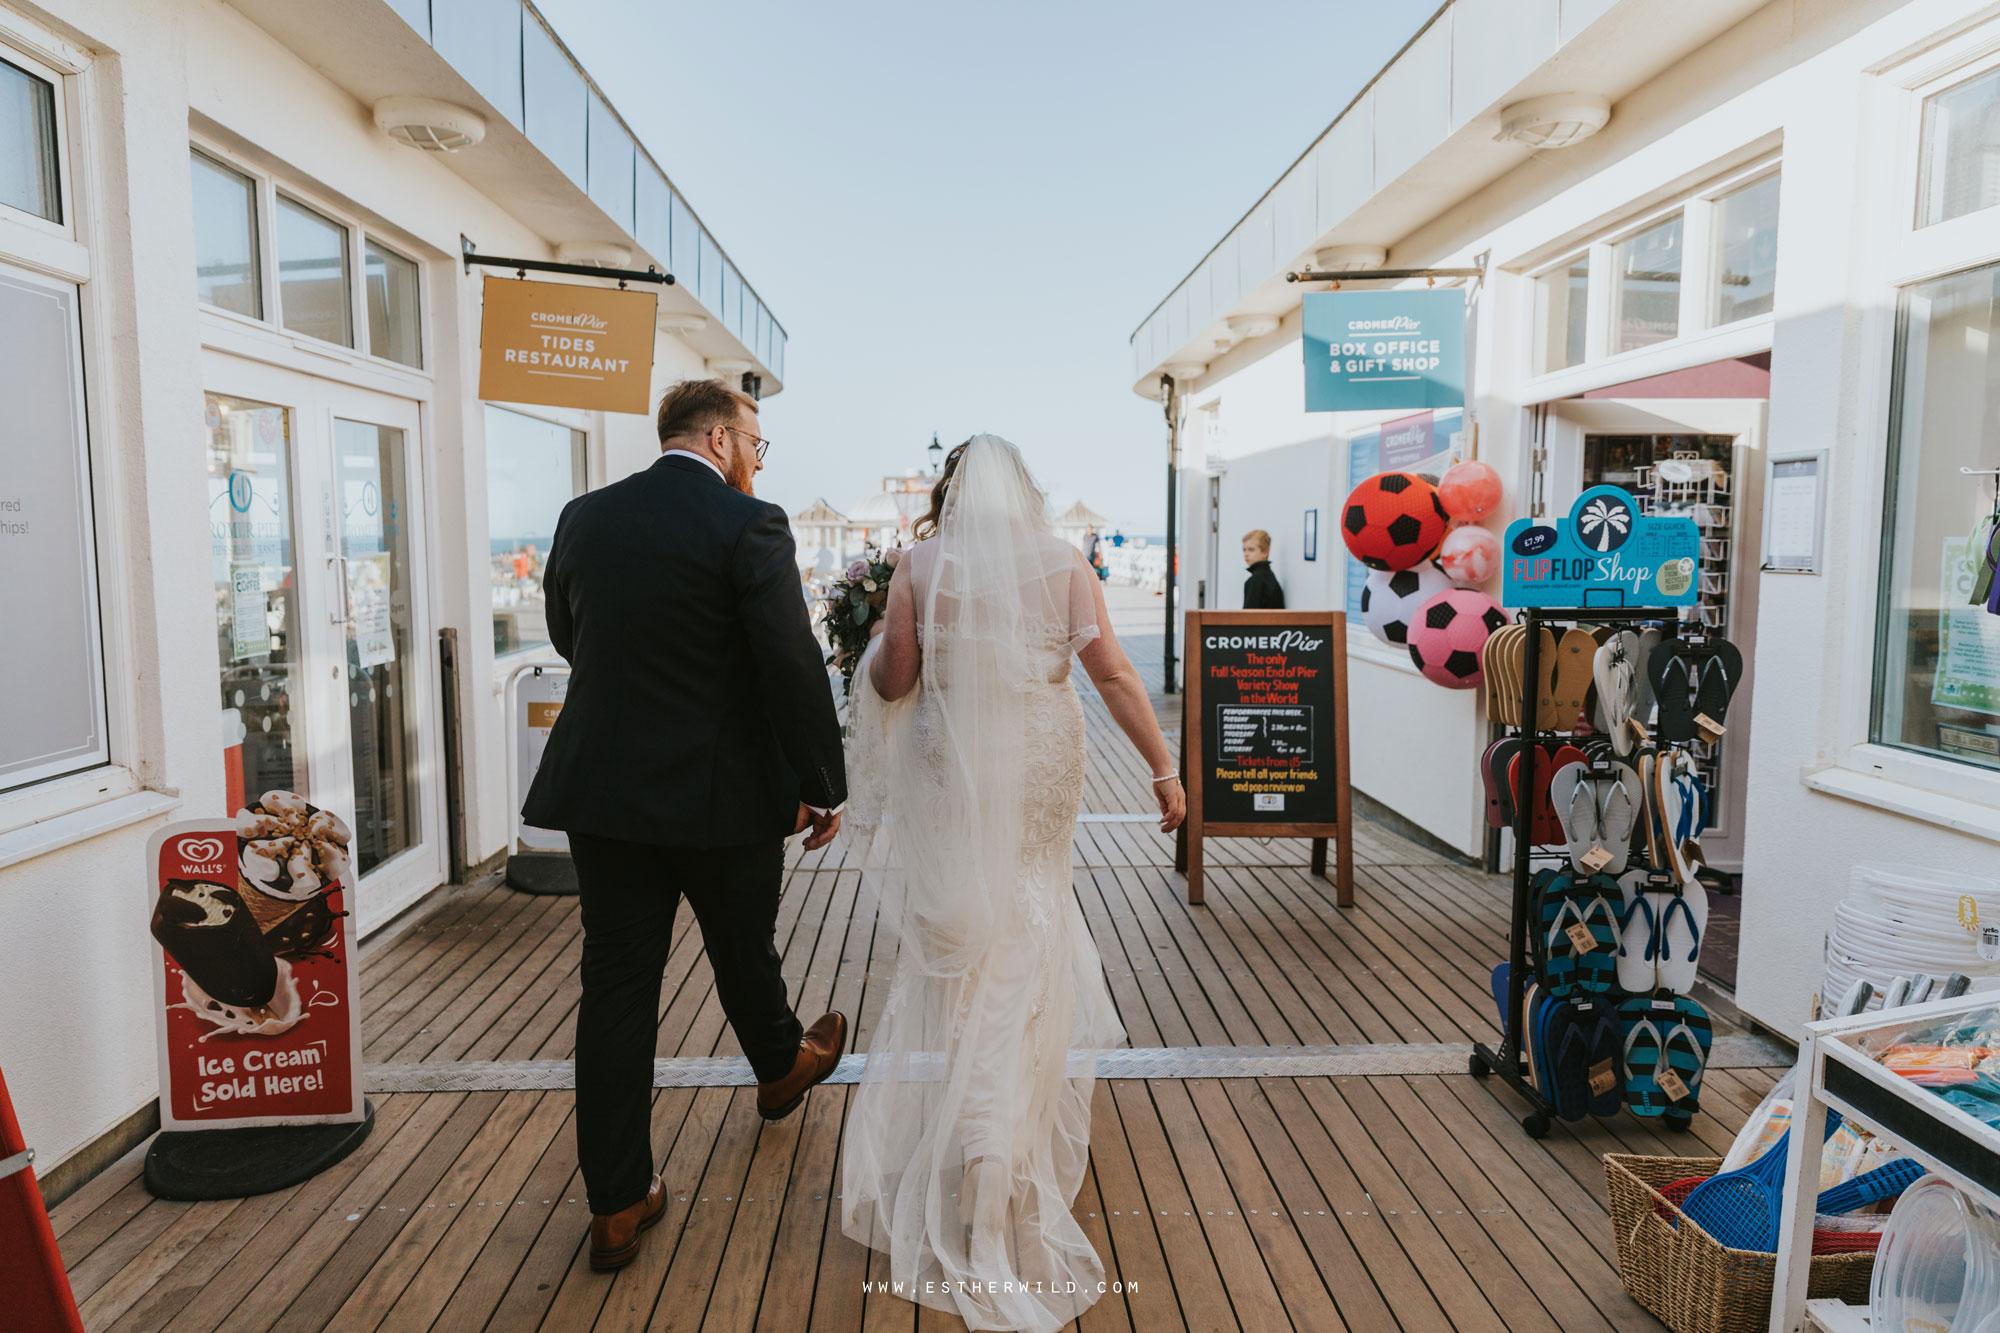 Cromer_Wedding_Beach_Outdoor_Ceremony_Norfolk_North_Lodge_Registry_Office_Rocket_House_Cafe_Cromer_Pier_IMG_4589.jpg